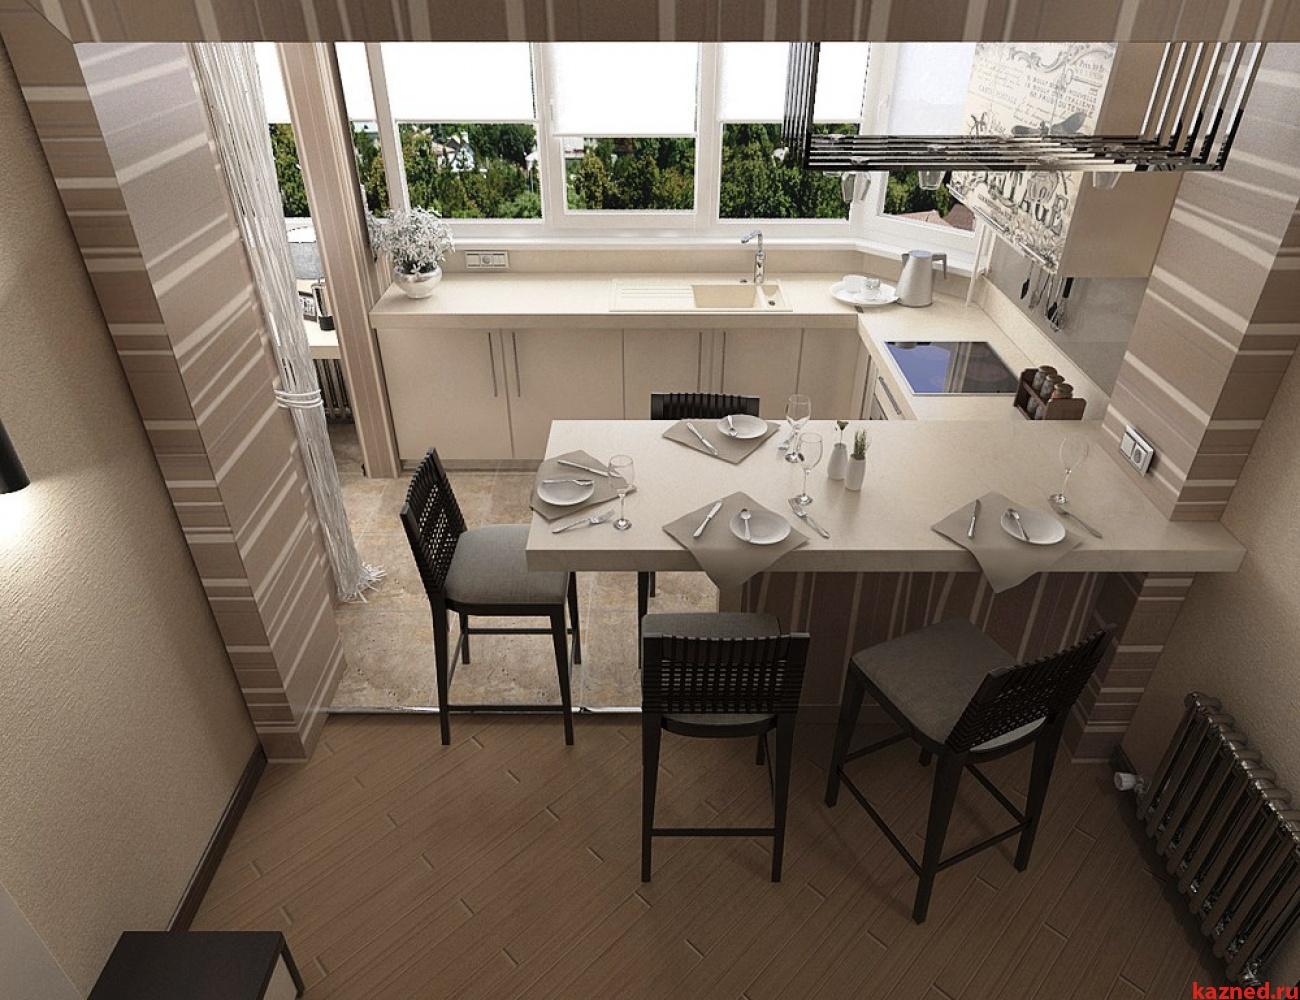 Кухня з лодж єю фото.